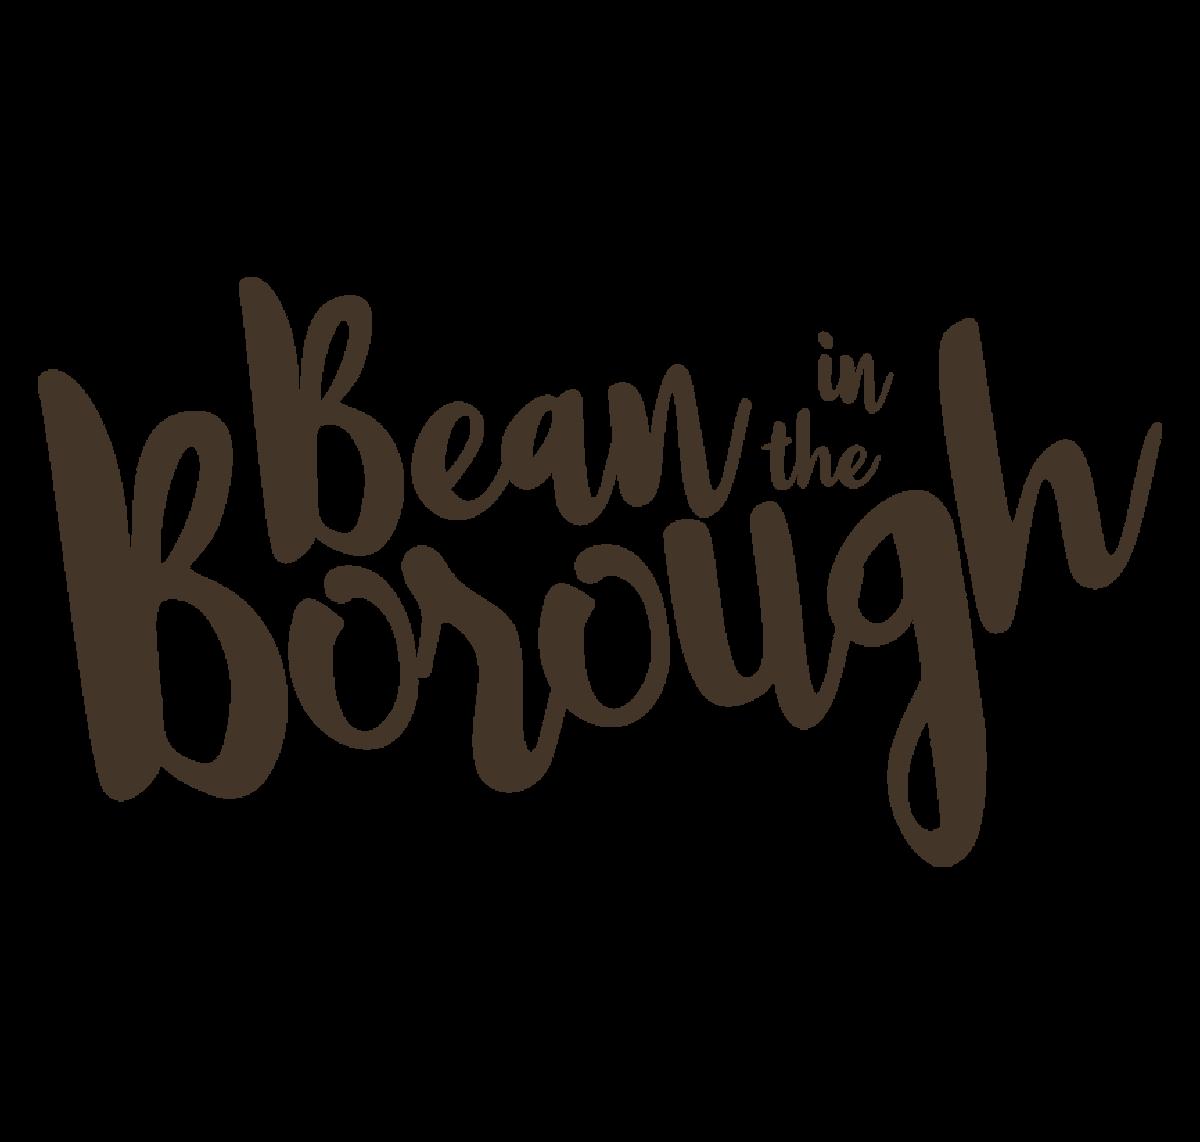 Bean in the Borough image 1